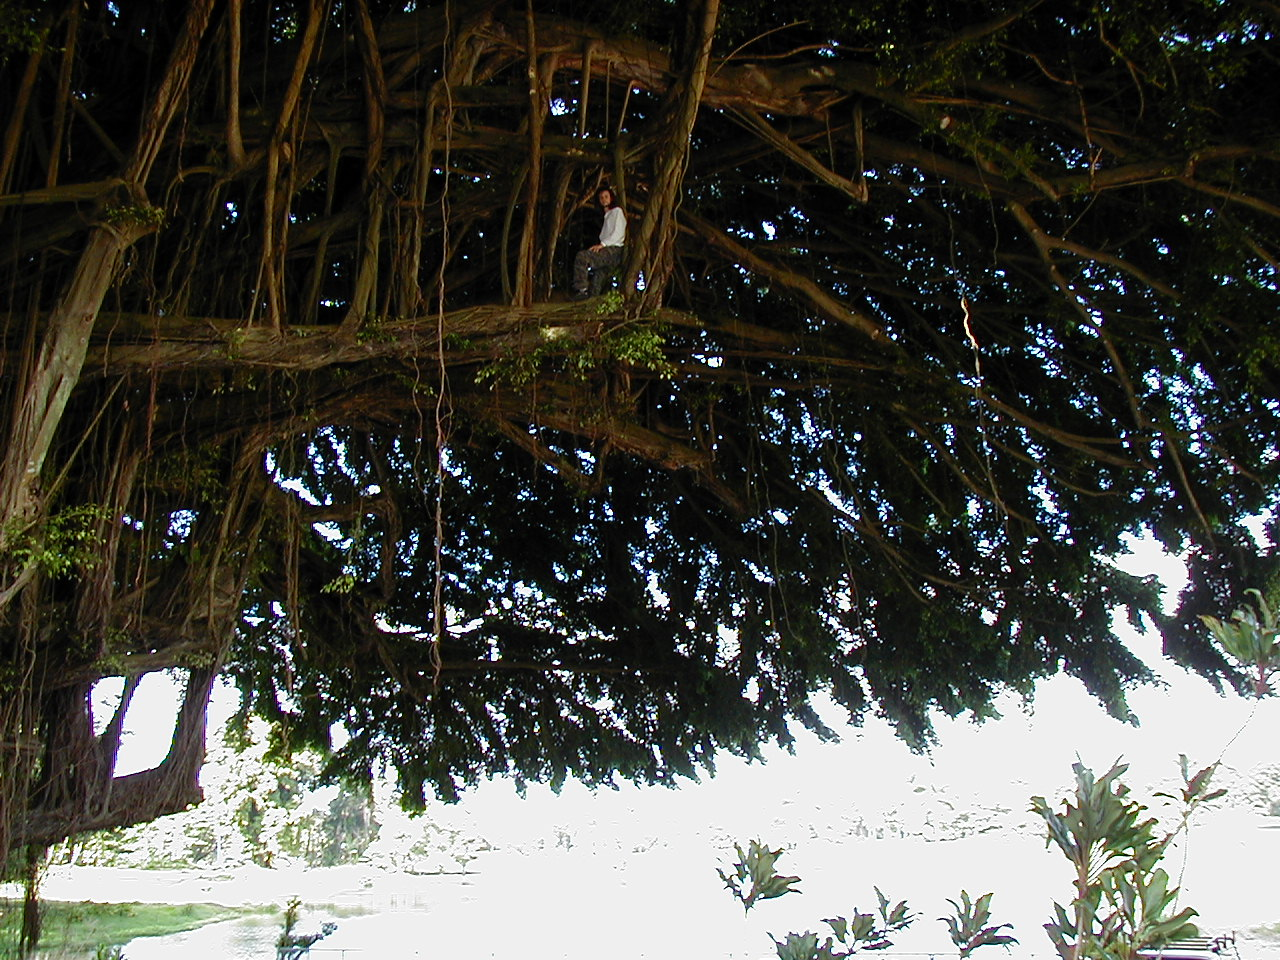 Kona Day One -- the Island Without Hope